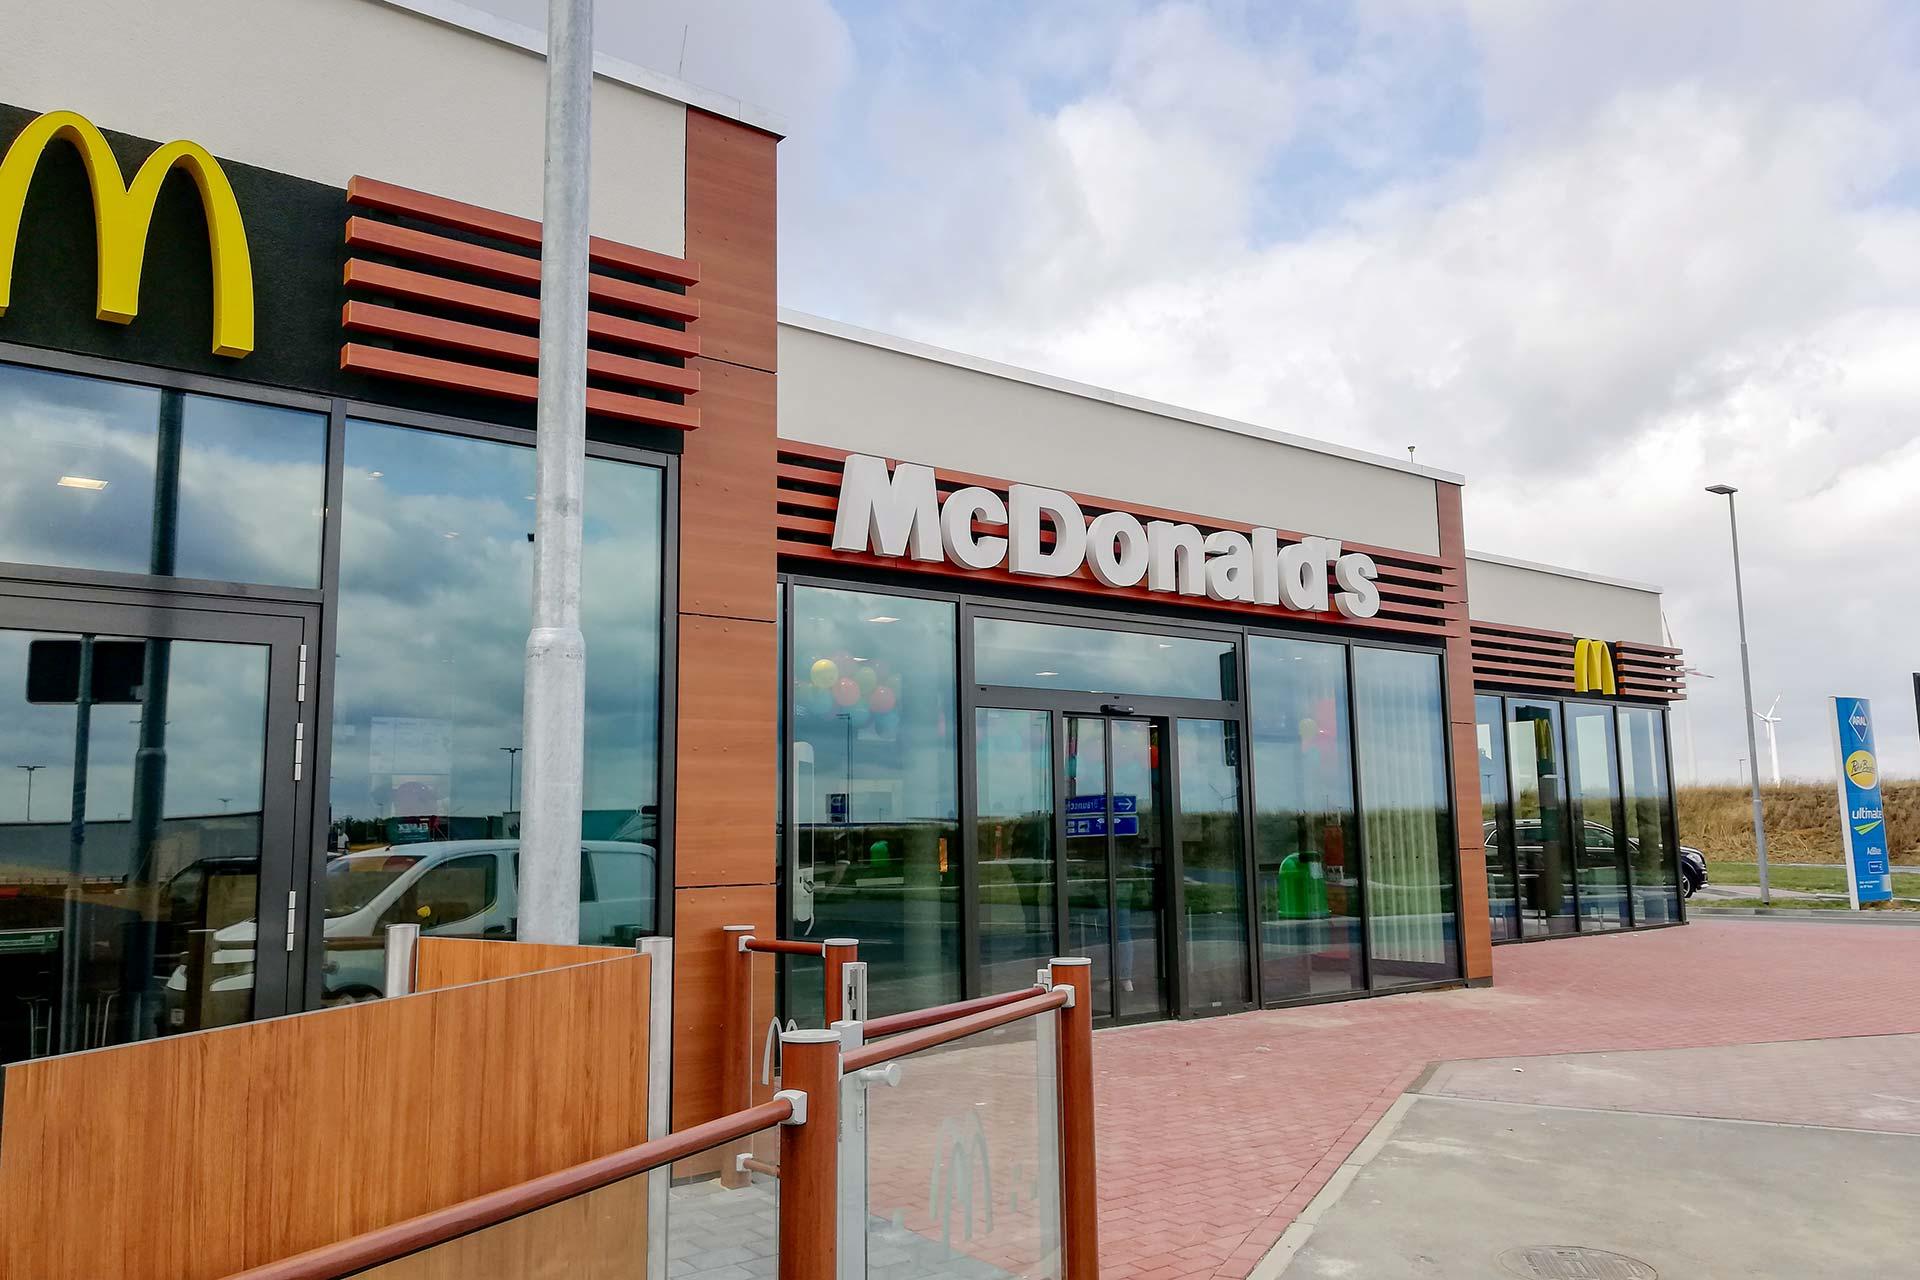 Projekte: McDonald's in Salzgitter (2019) - Anbauten an Tankstellen auf Raststätte